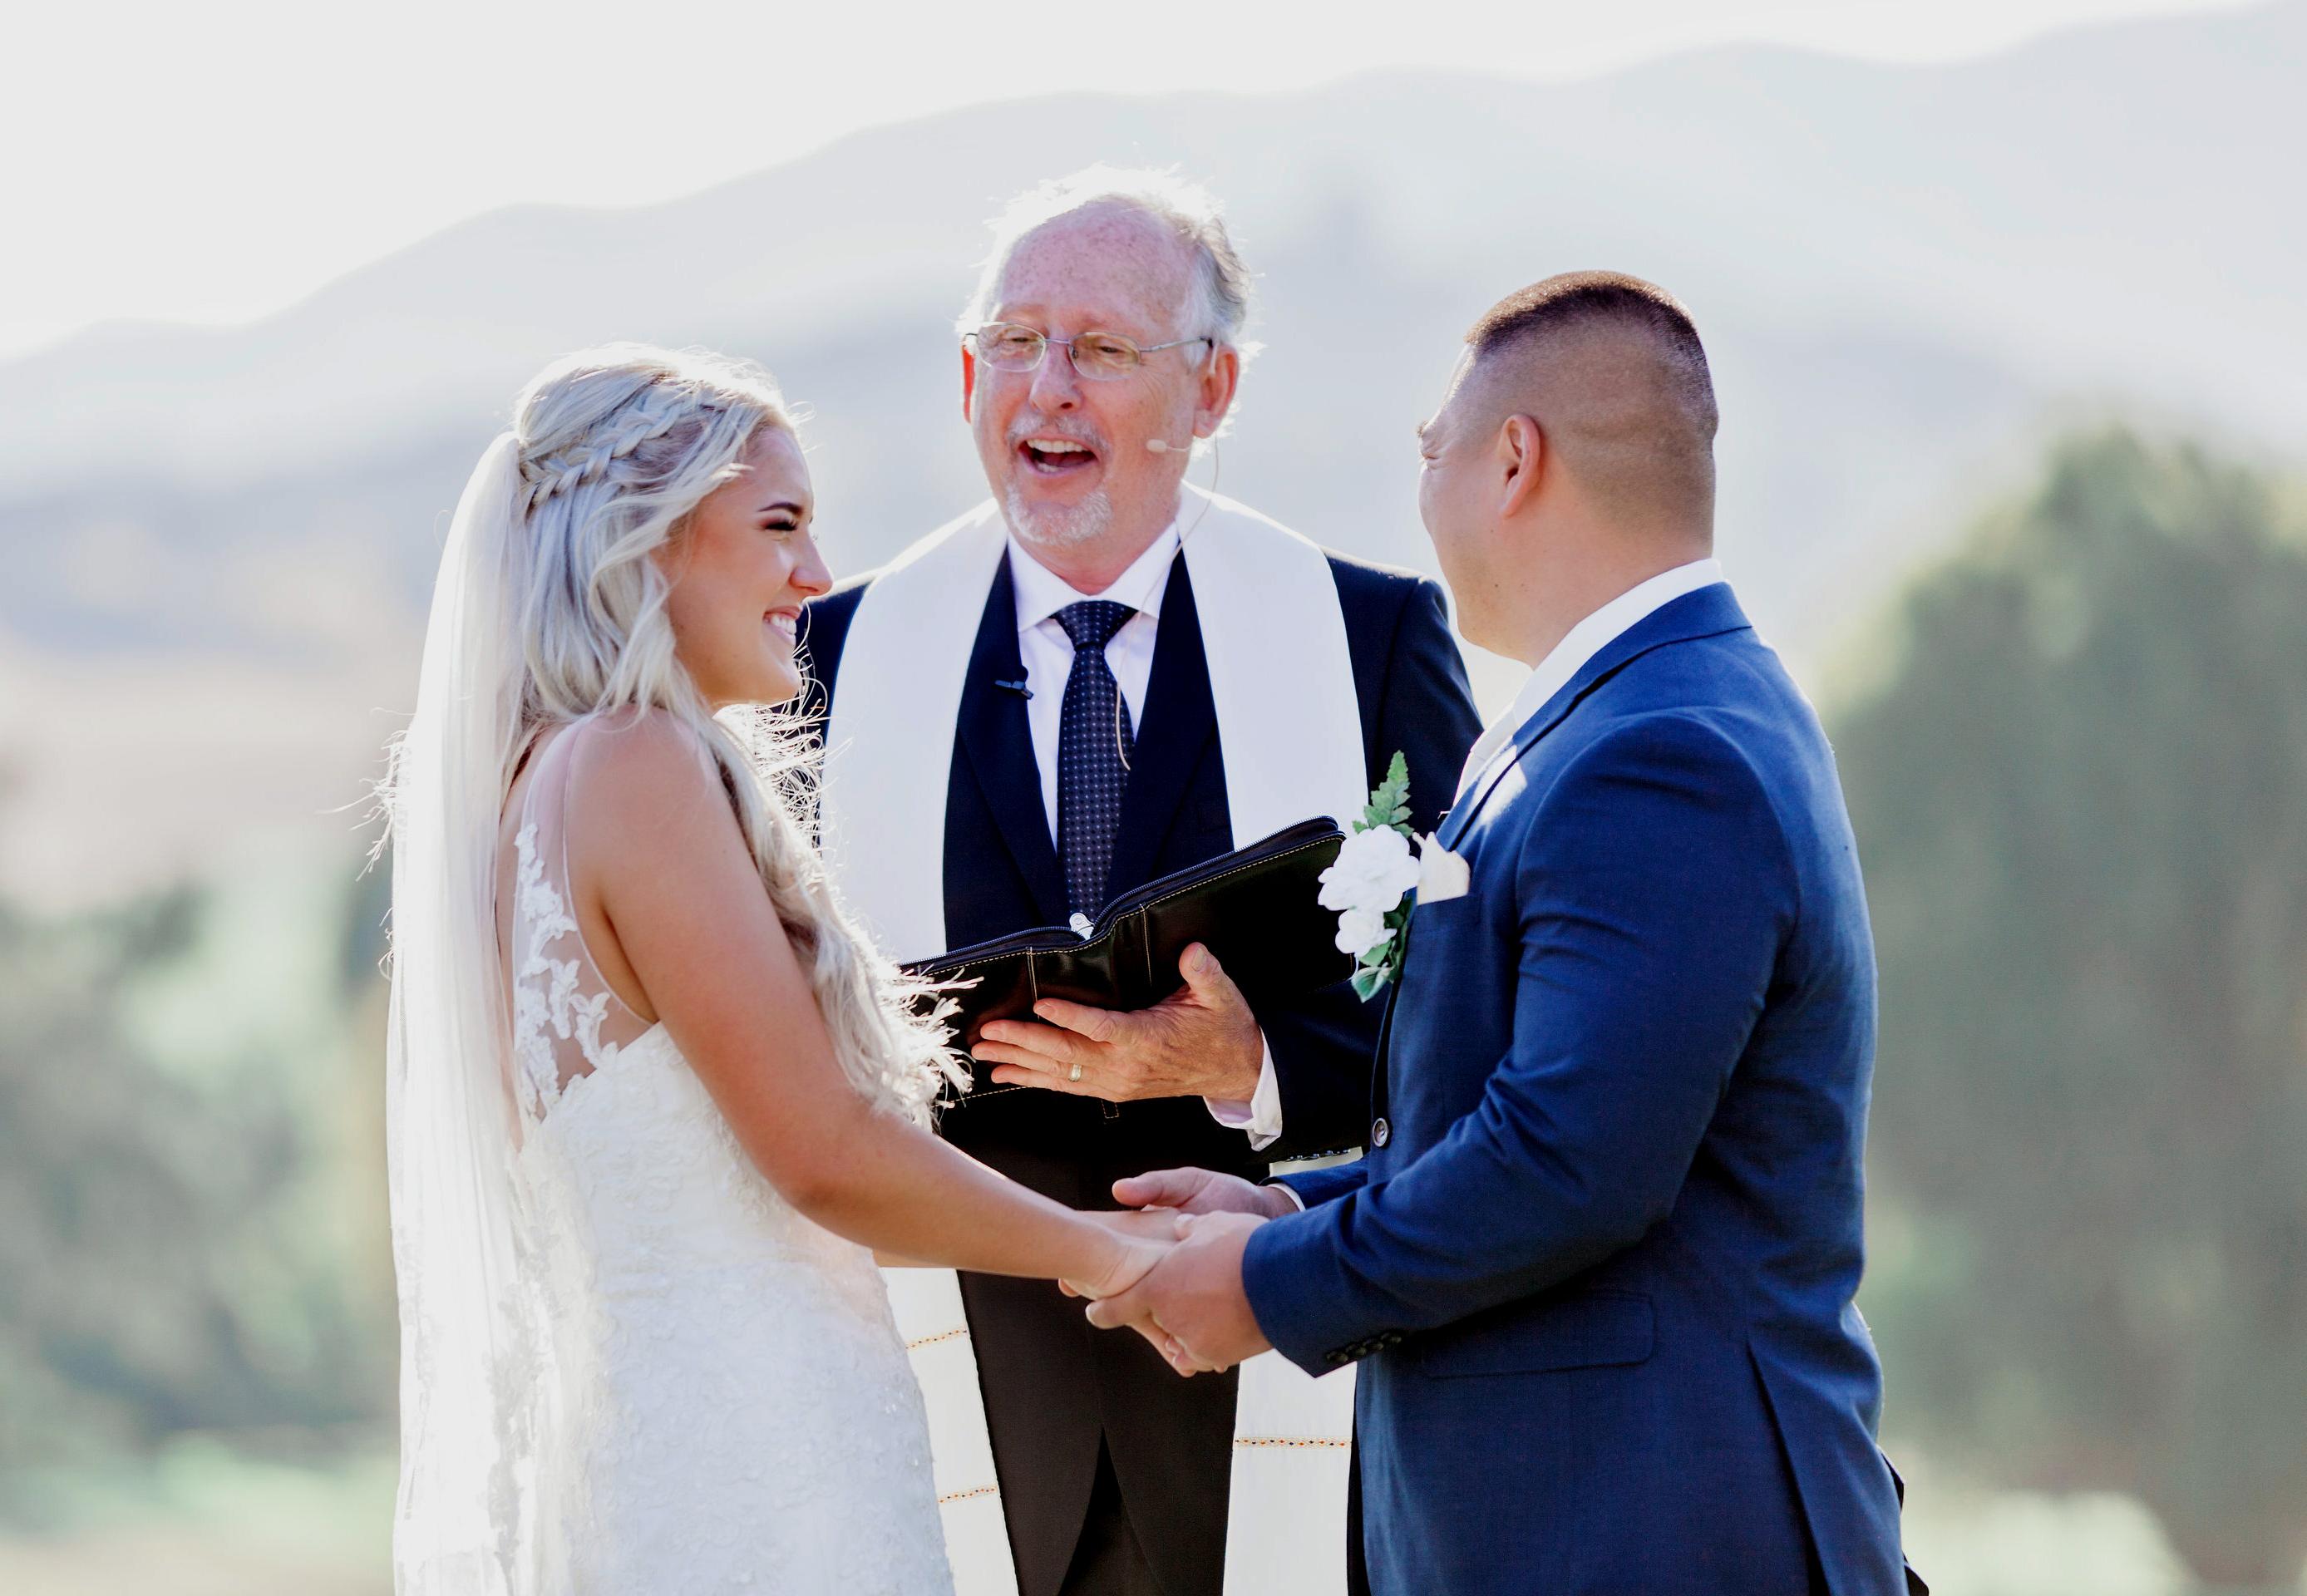 Weddings In San Luis Obispo Countryside Olive Tree Officiating,New York City Hall Wedding Dresses